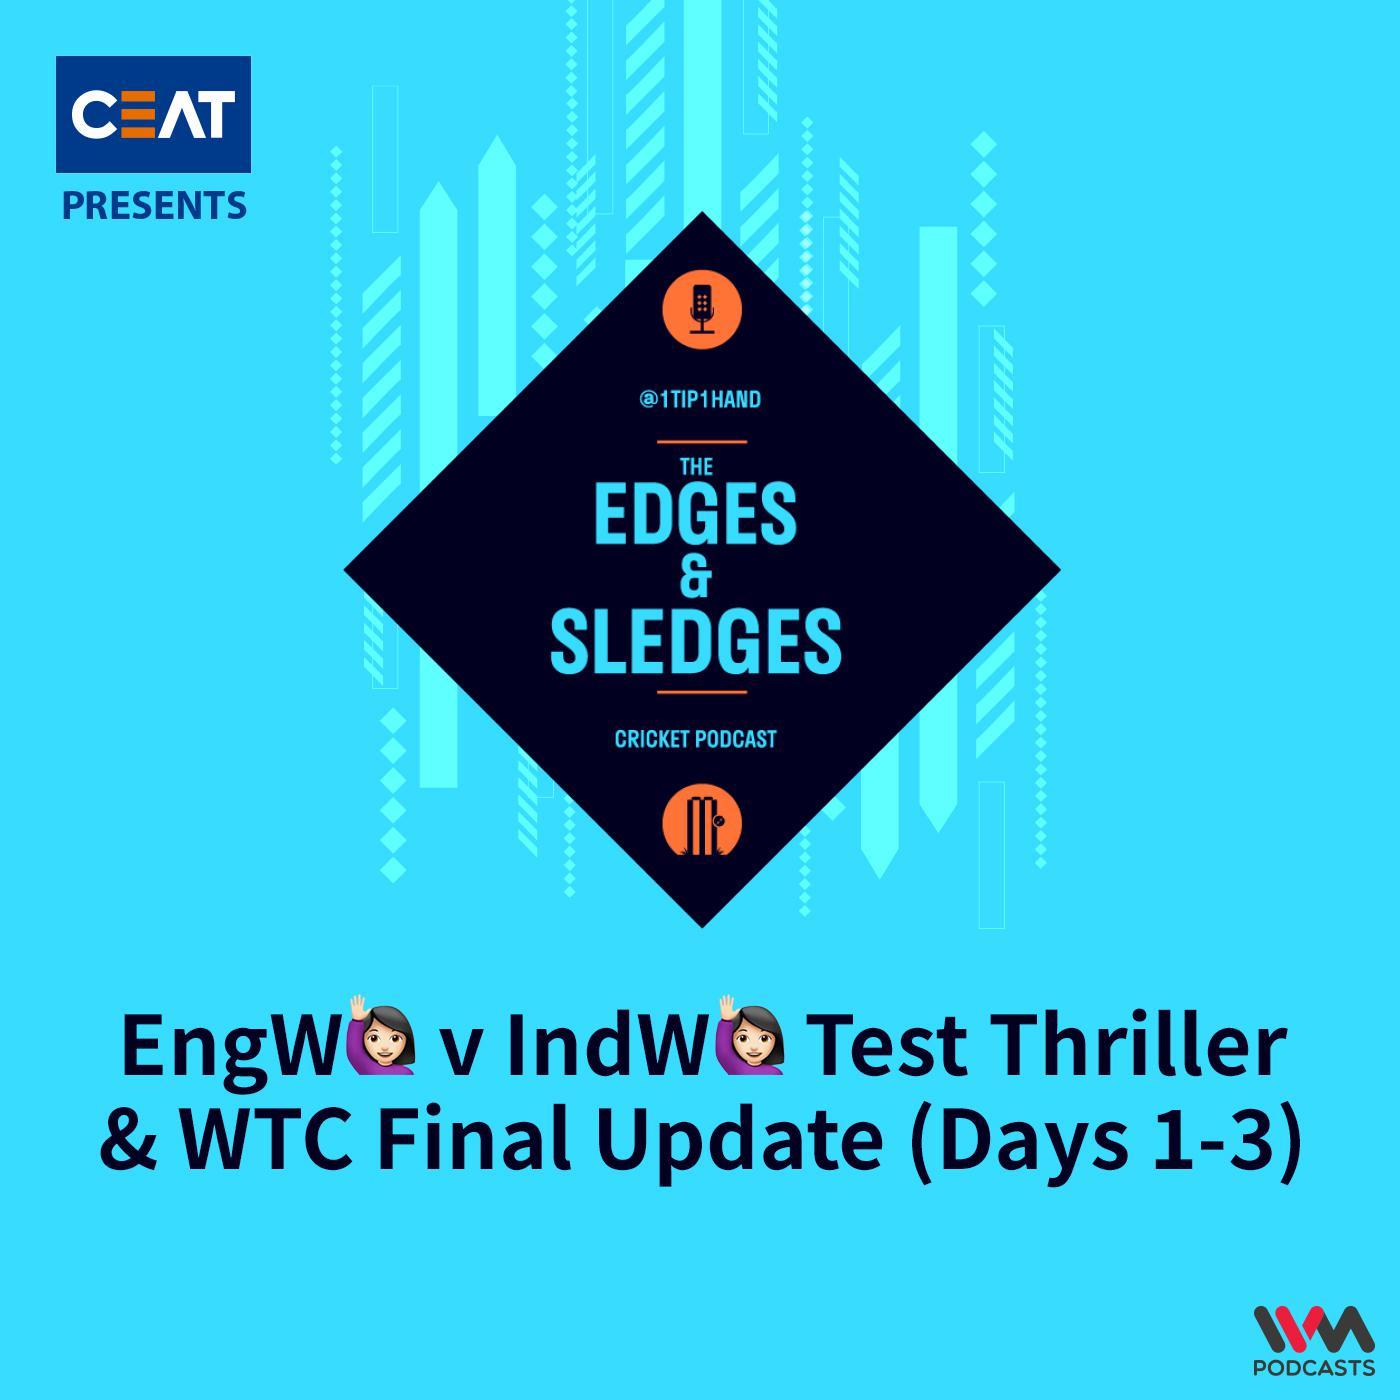 Ep. 180: EngW v IndW Test Thriller & WTC Final Update (Days 1-3)